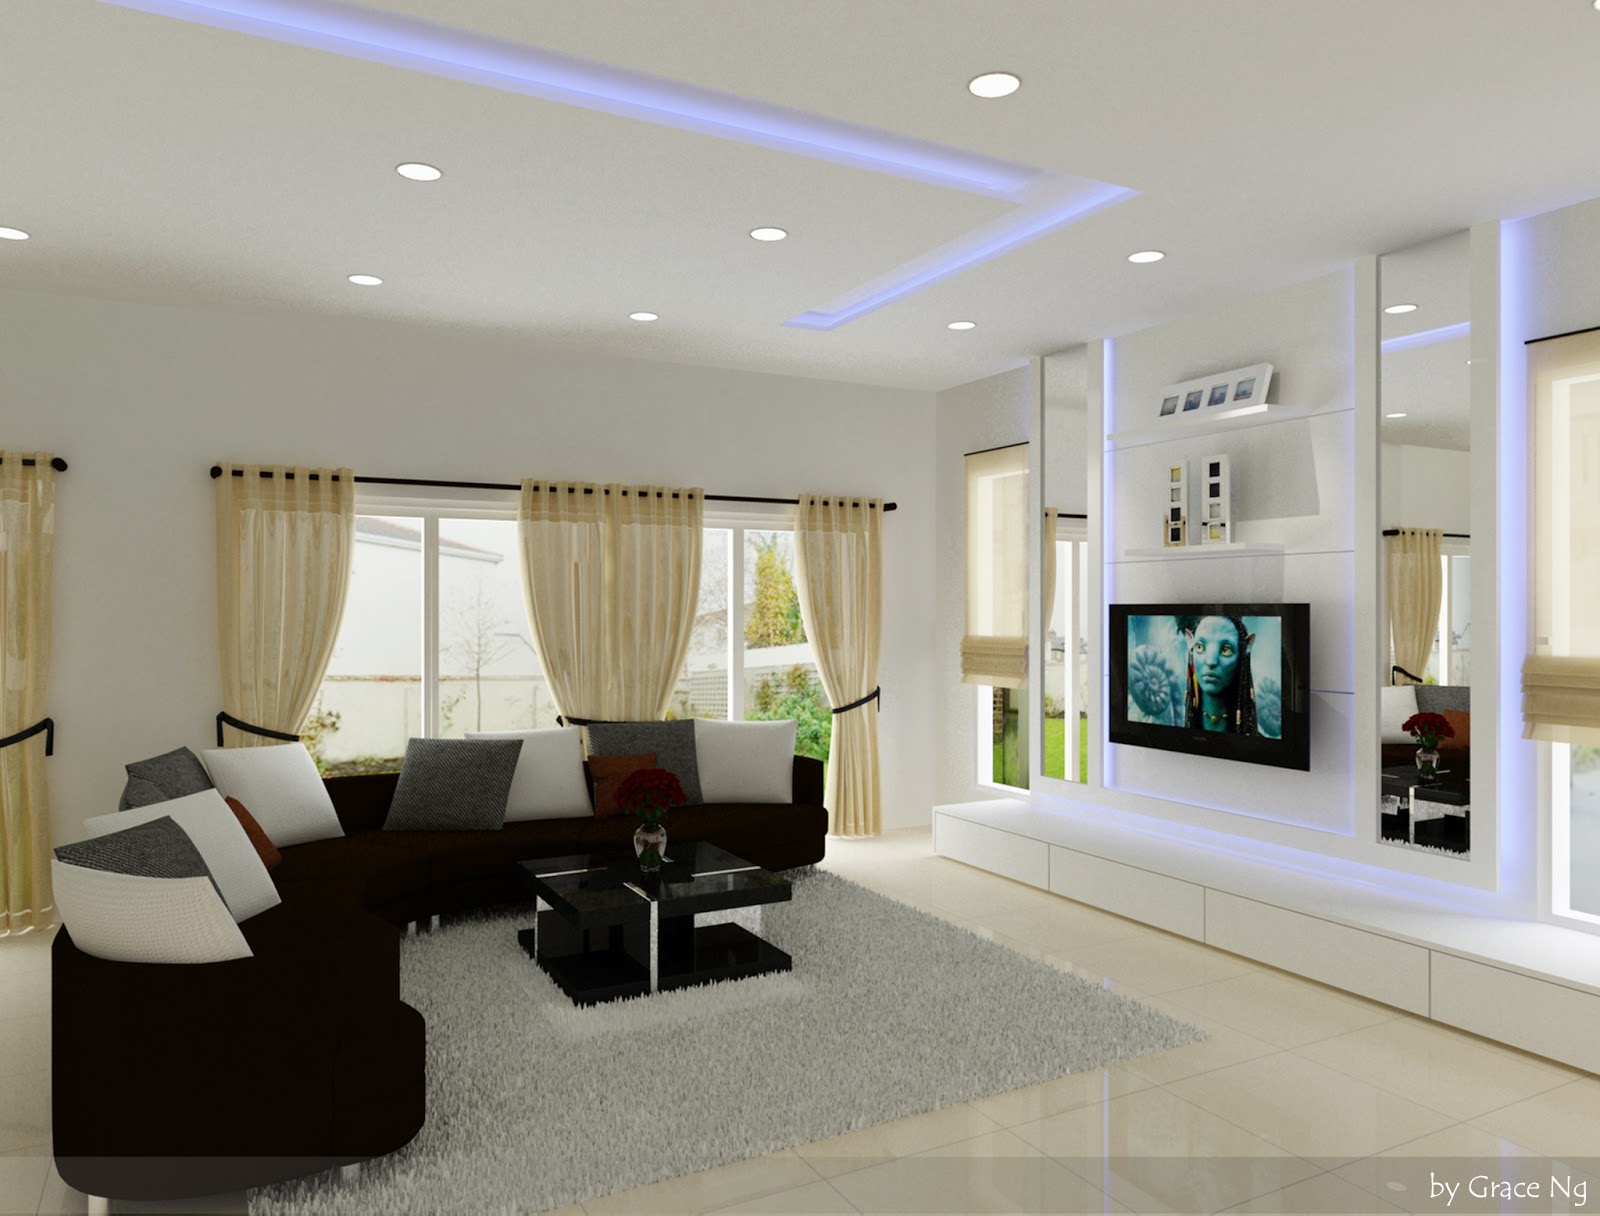 Interior 3d visualized design proposed interior for Living area interior design